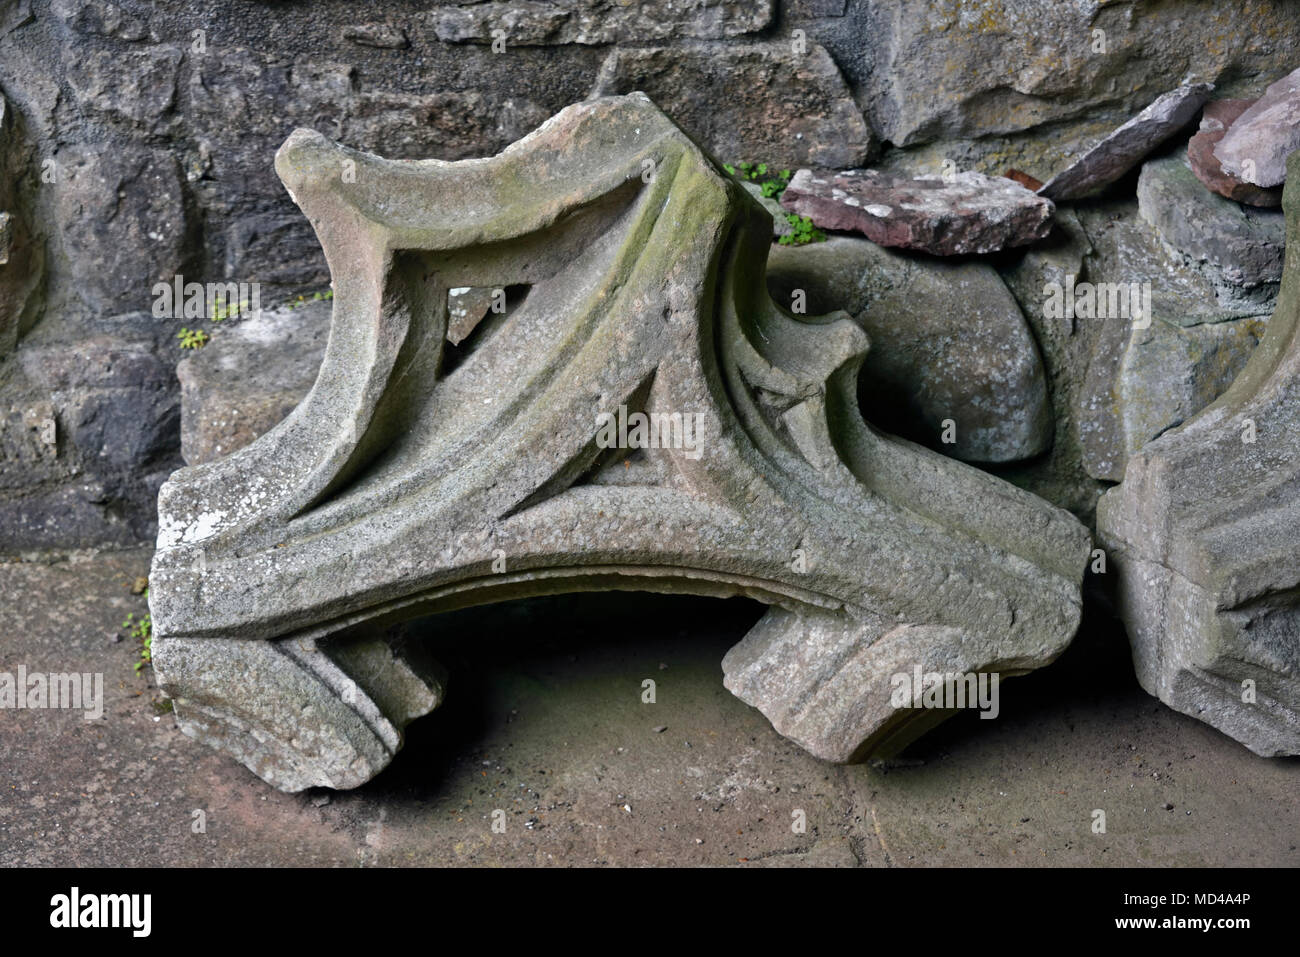 Stone fragments. Dryburgh Abbey. Dryburgh, St.Boswells, Roxburghshire, Scottish Borders, Scotland, United Kingdom, Europe. - Stock Image